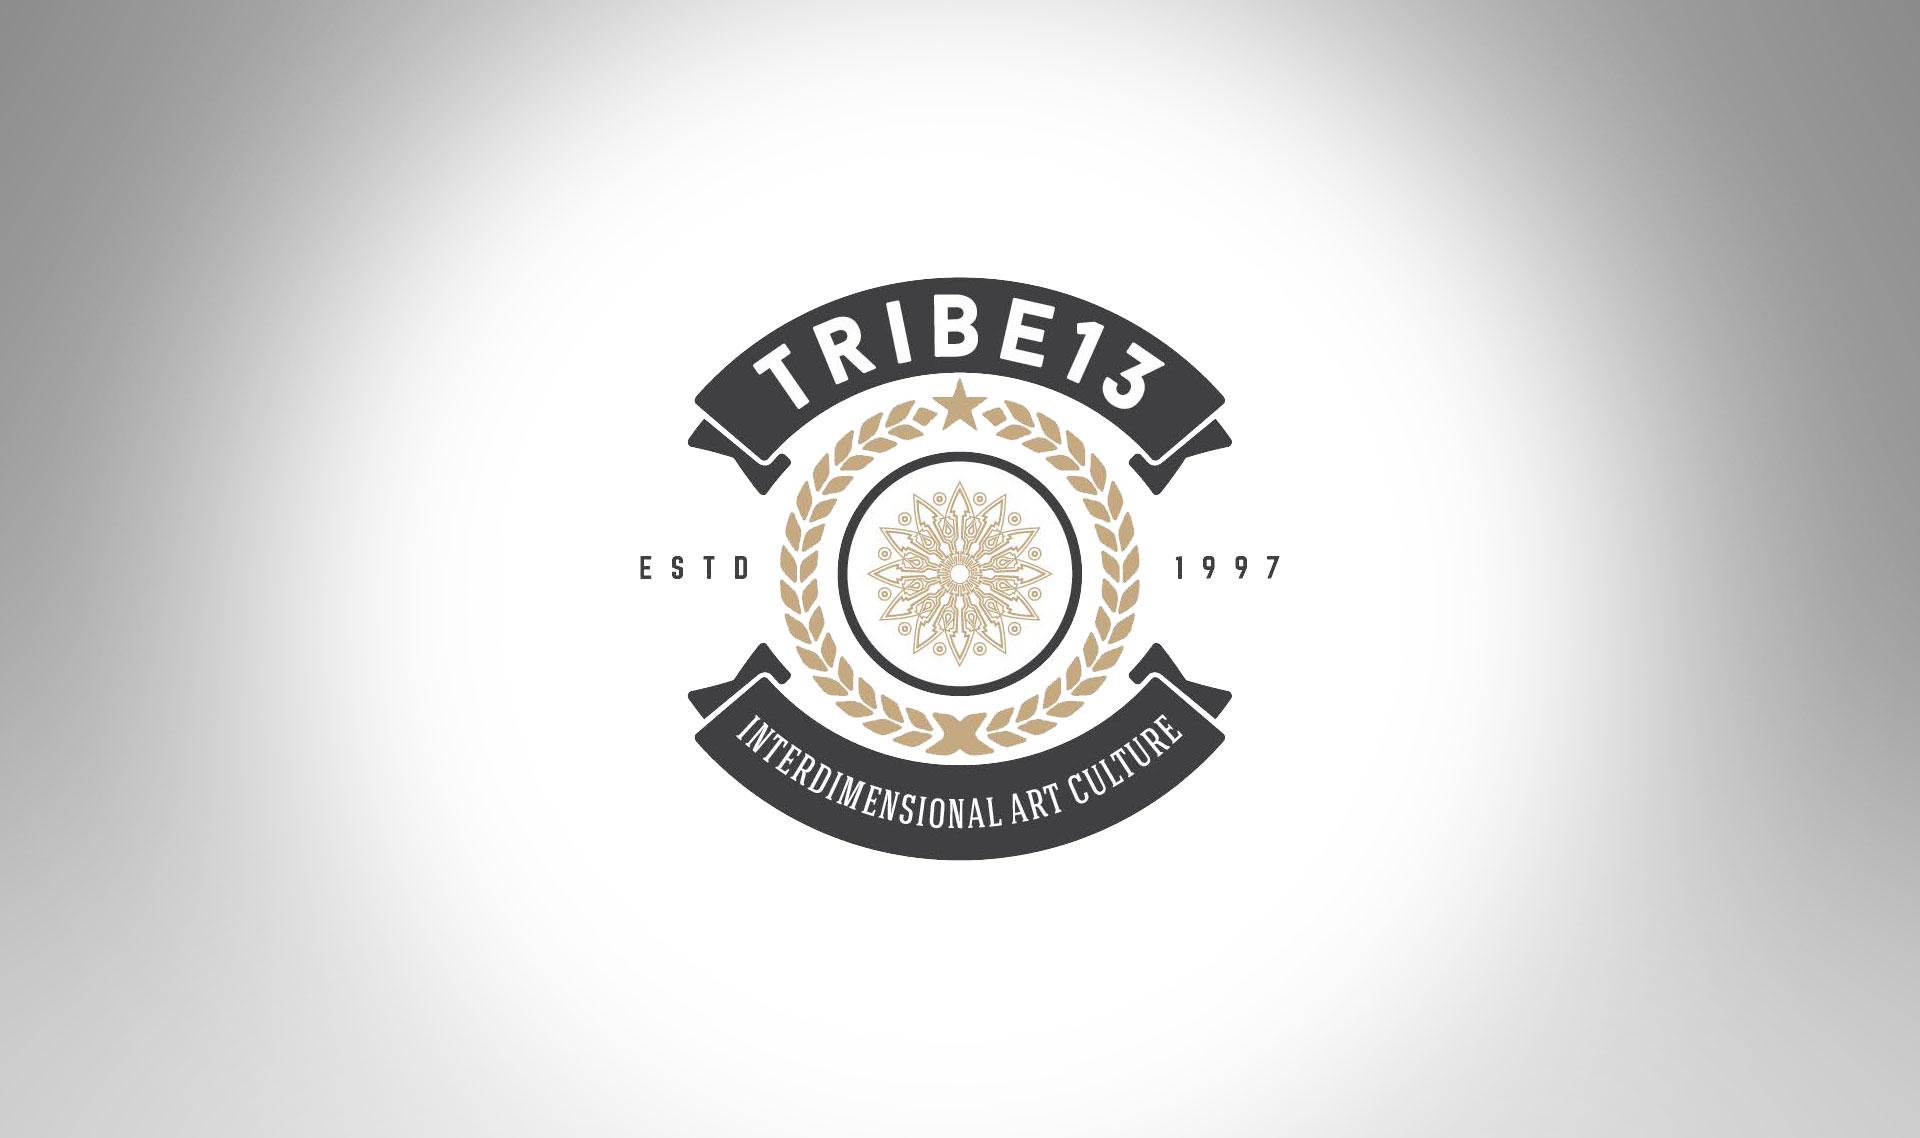 Tribe 13